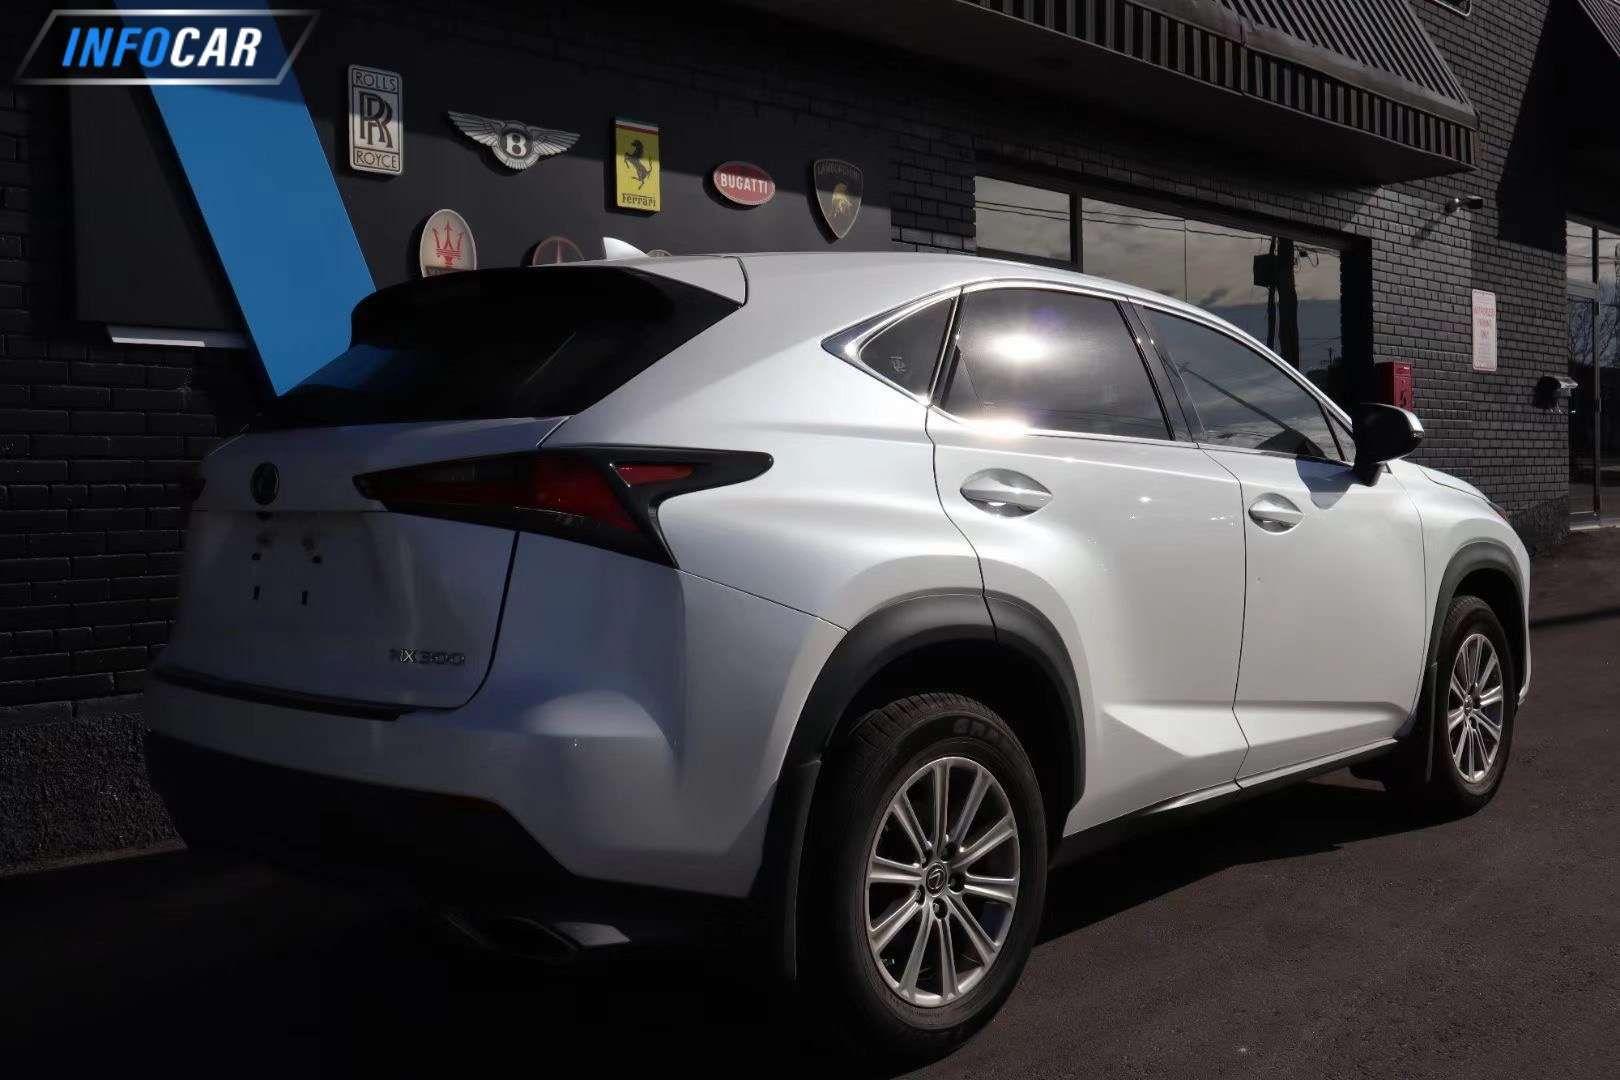 2020 Lexus NX 300 BASE MODEL - INFOCAR - Toronto's Most Comprehensive New and Used Auto Trading Platform